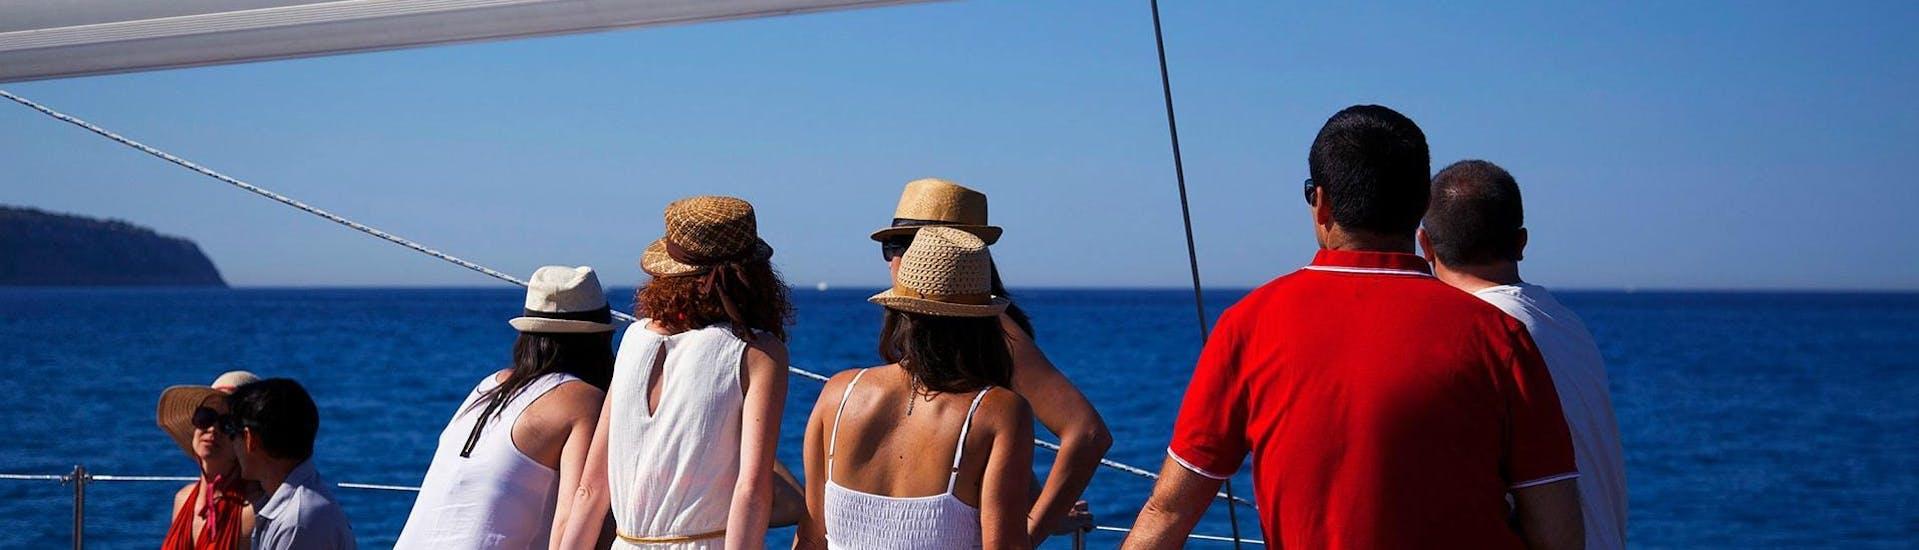 private-boat-tour-1-2-low-season-palma-de-mallorca-oasis-catamaran-hero